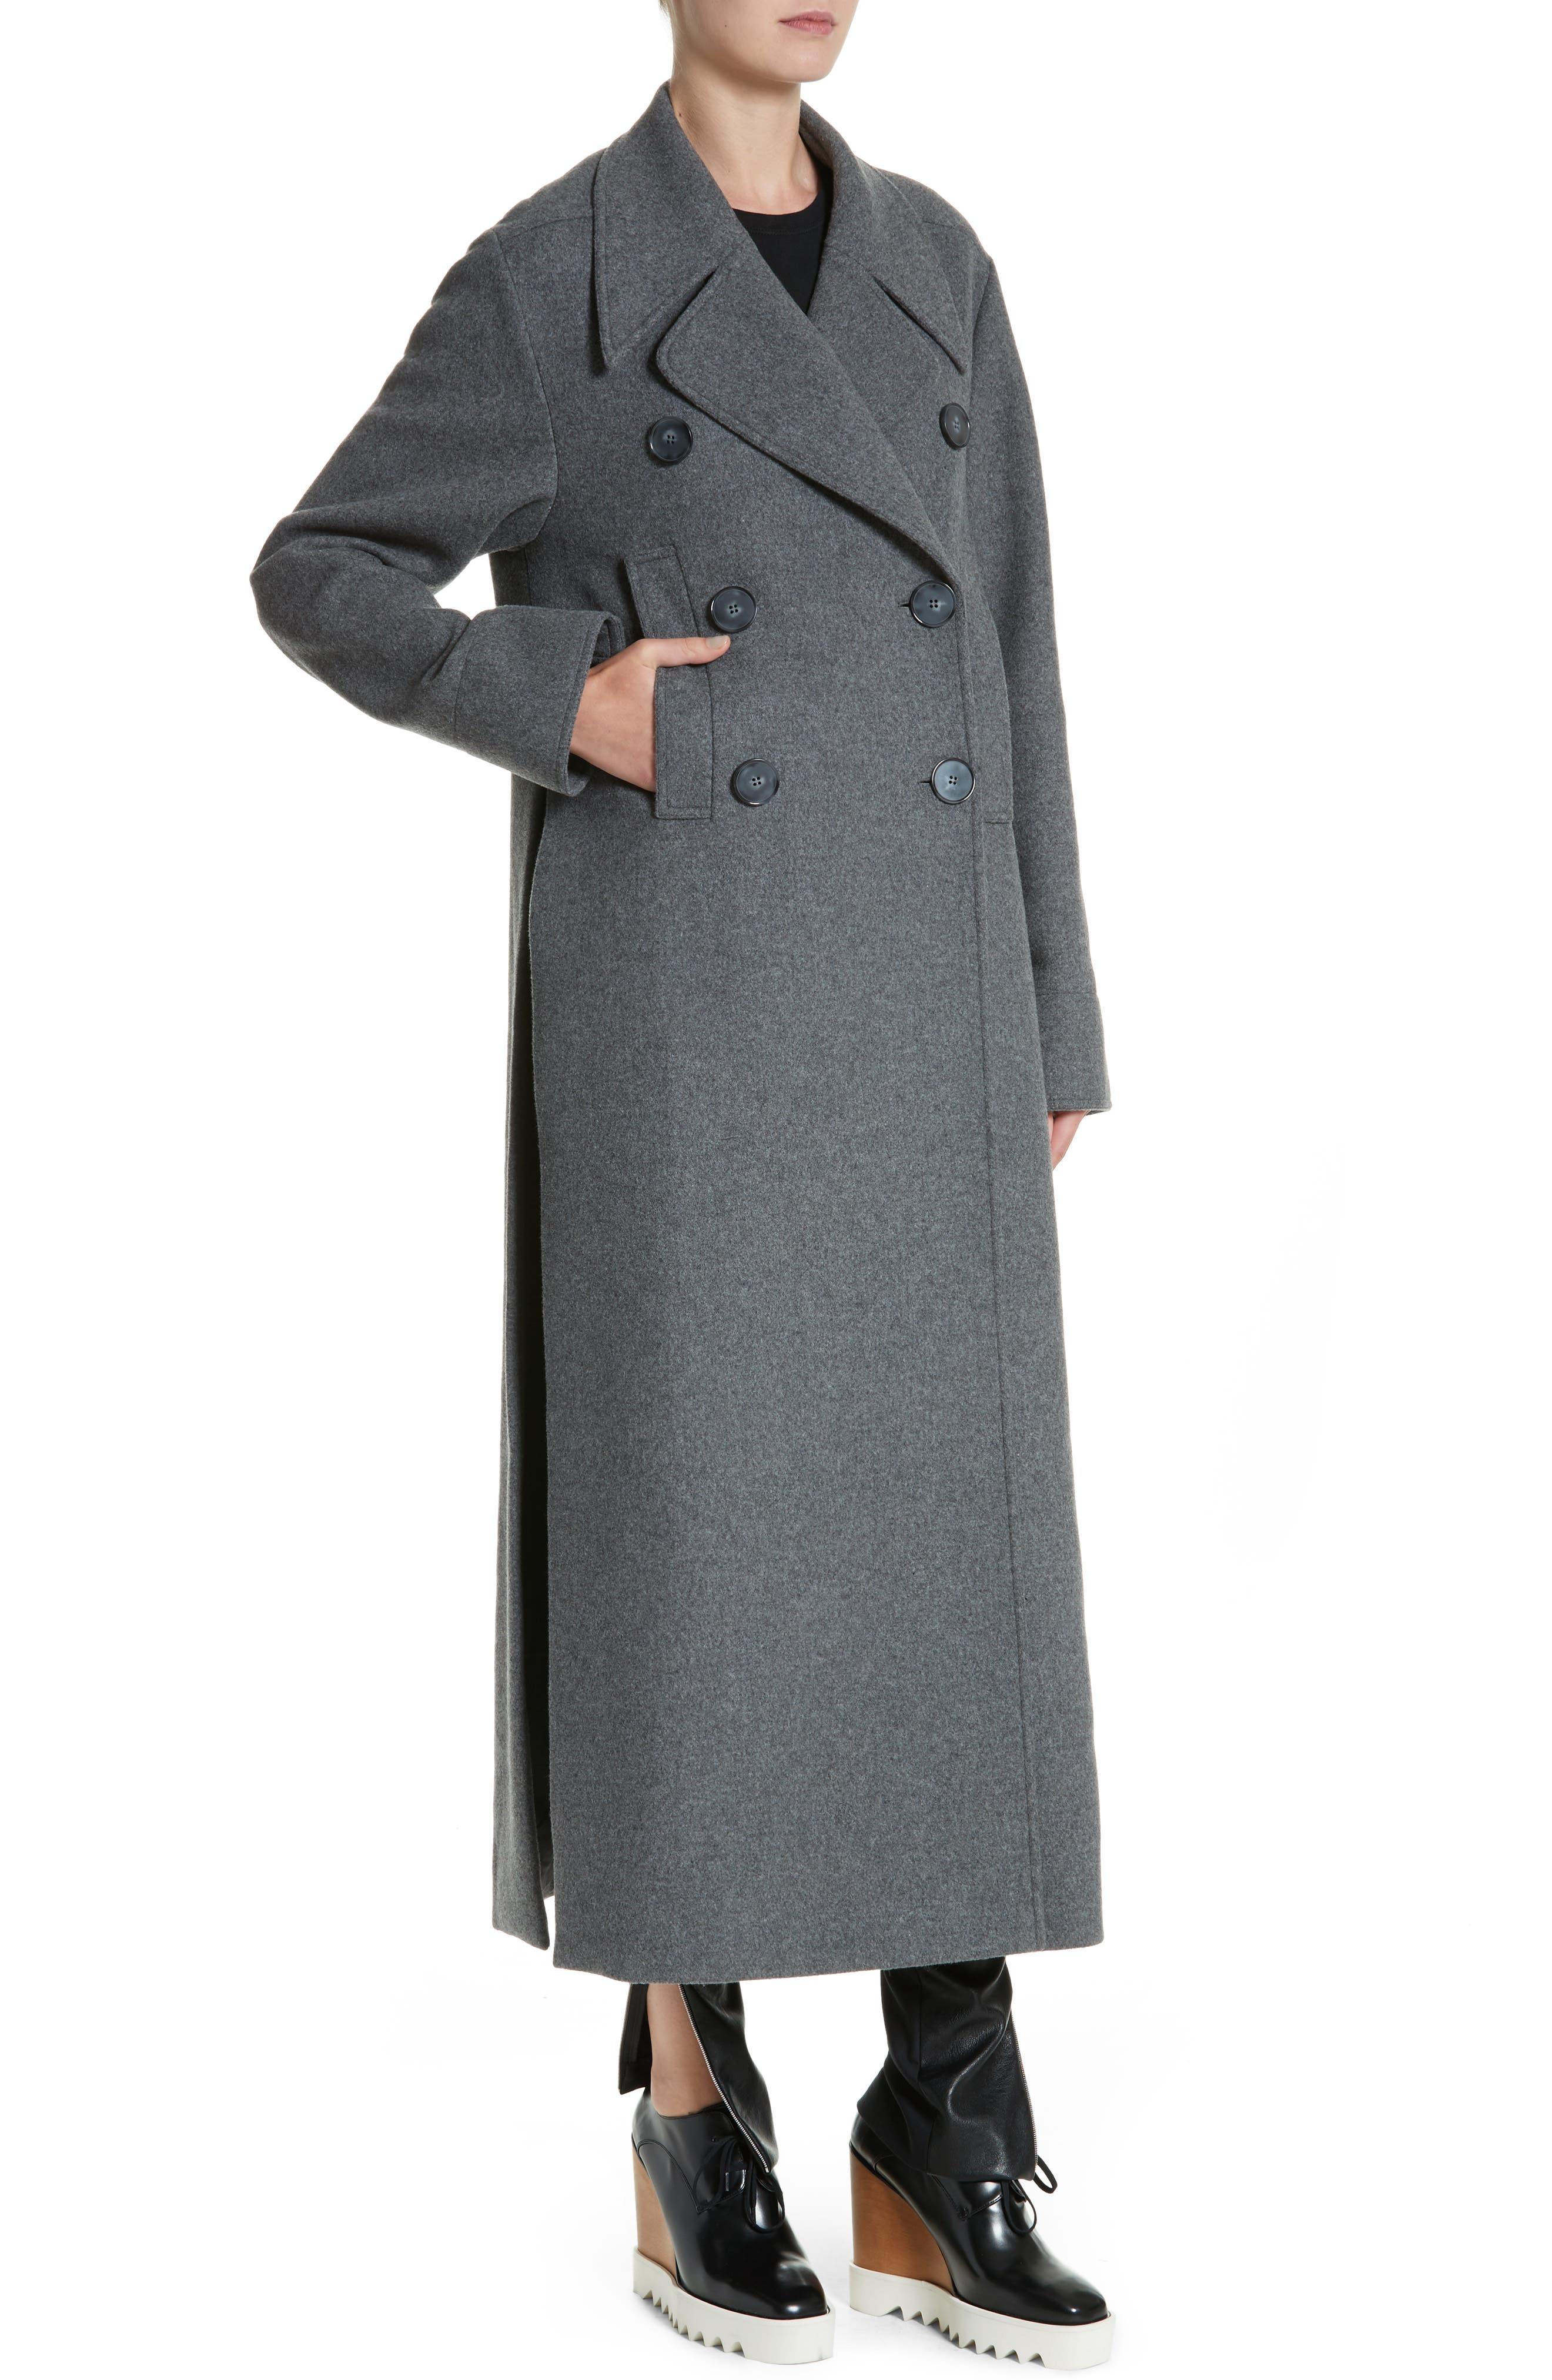 Edwina Long Double Breasted Wool Blend Coat,                             Alternate thumbnail 4, color,                             076